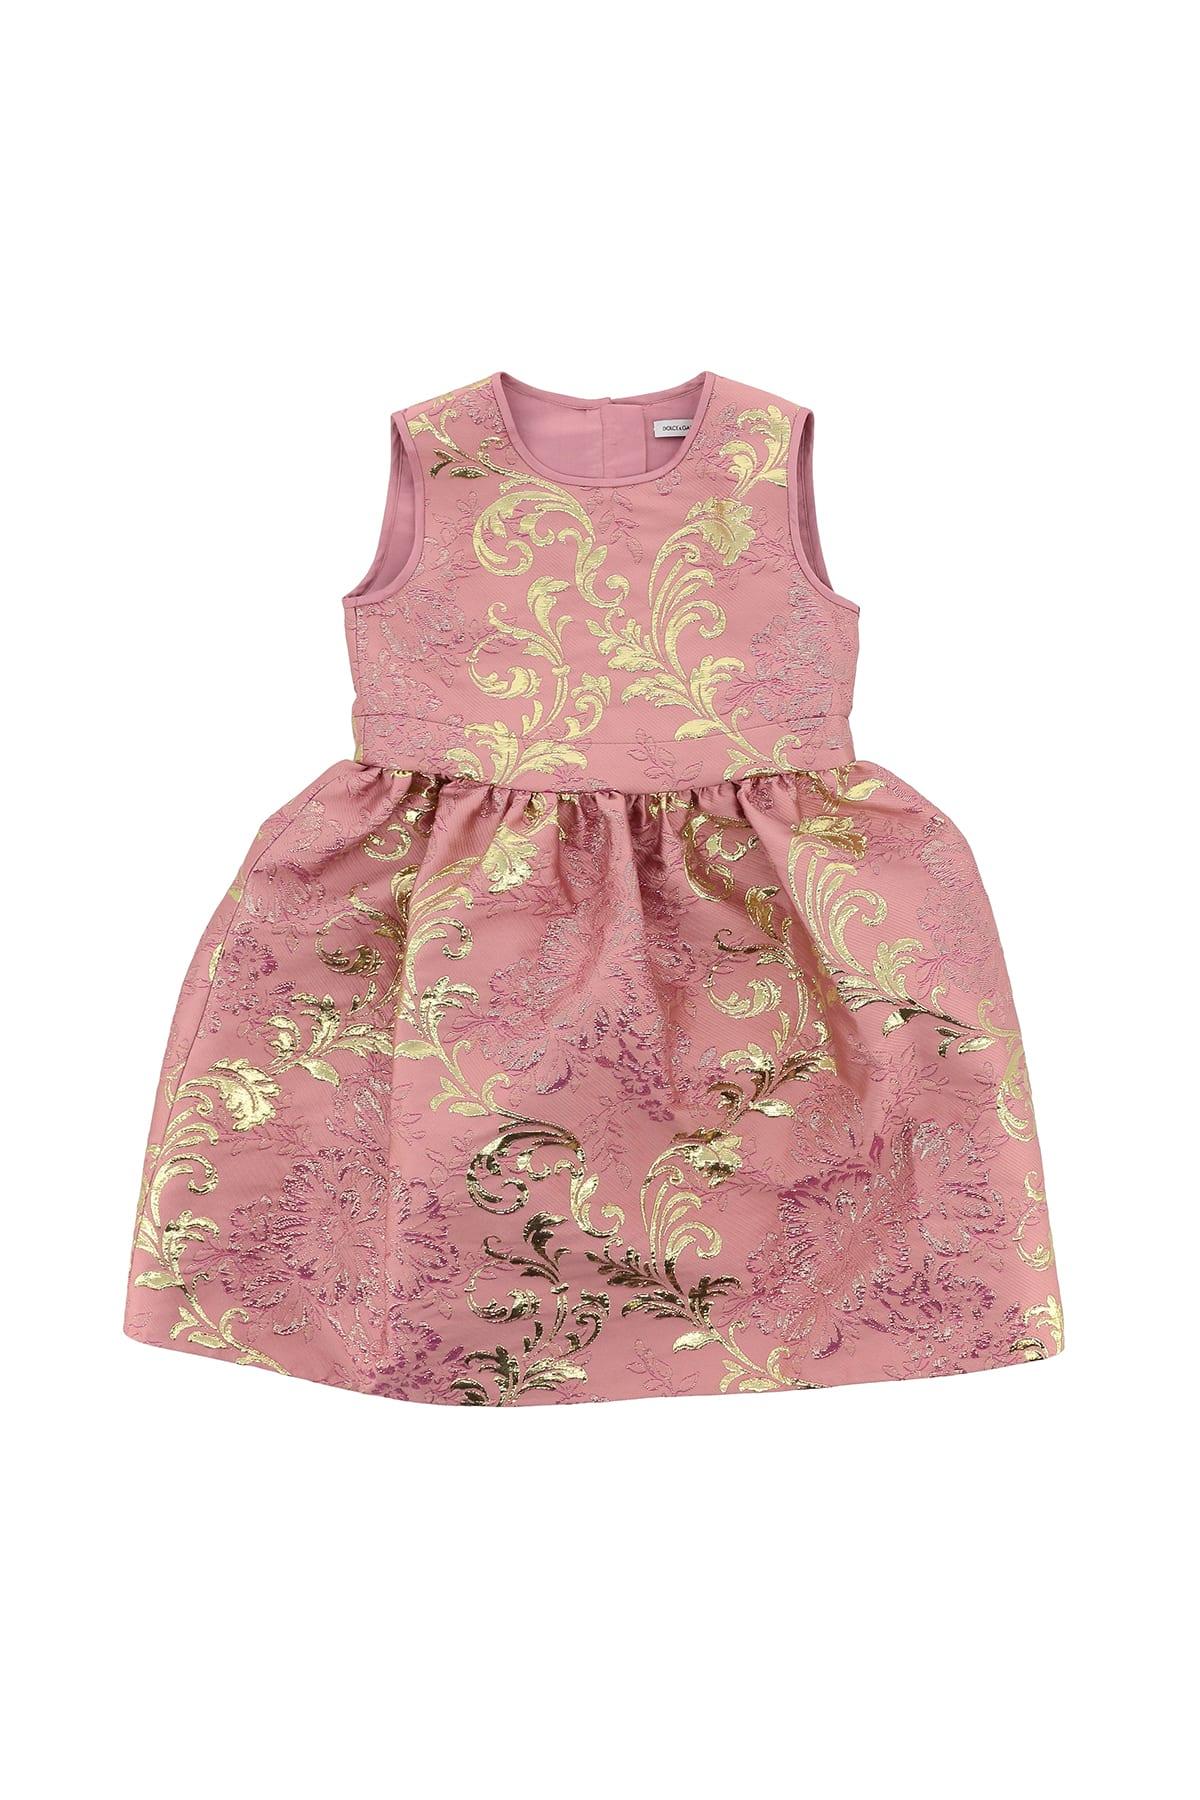 Buy Dolce & Gabbana Floral Jacquard Midi Dress online, shop Dolce & Gabbana with free shipping